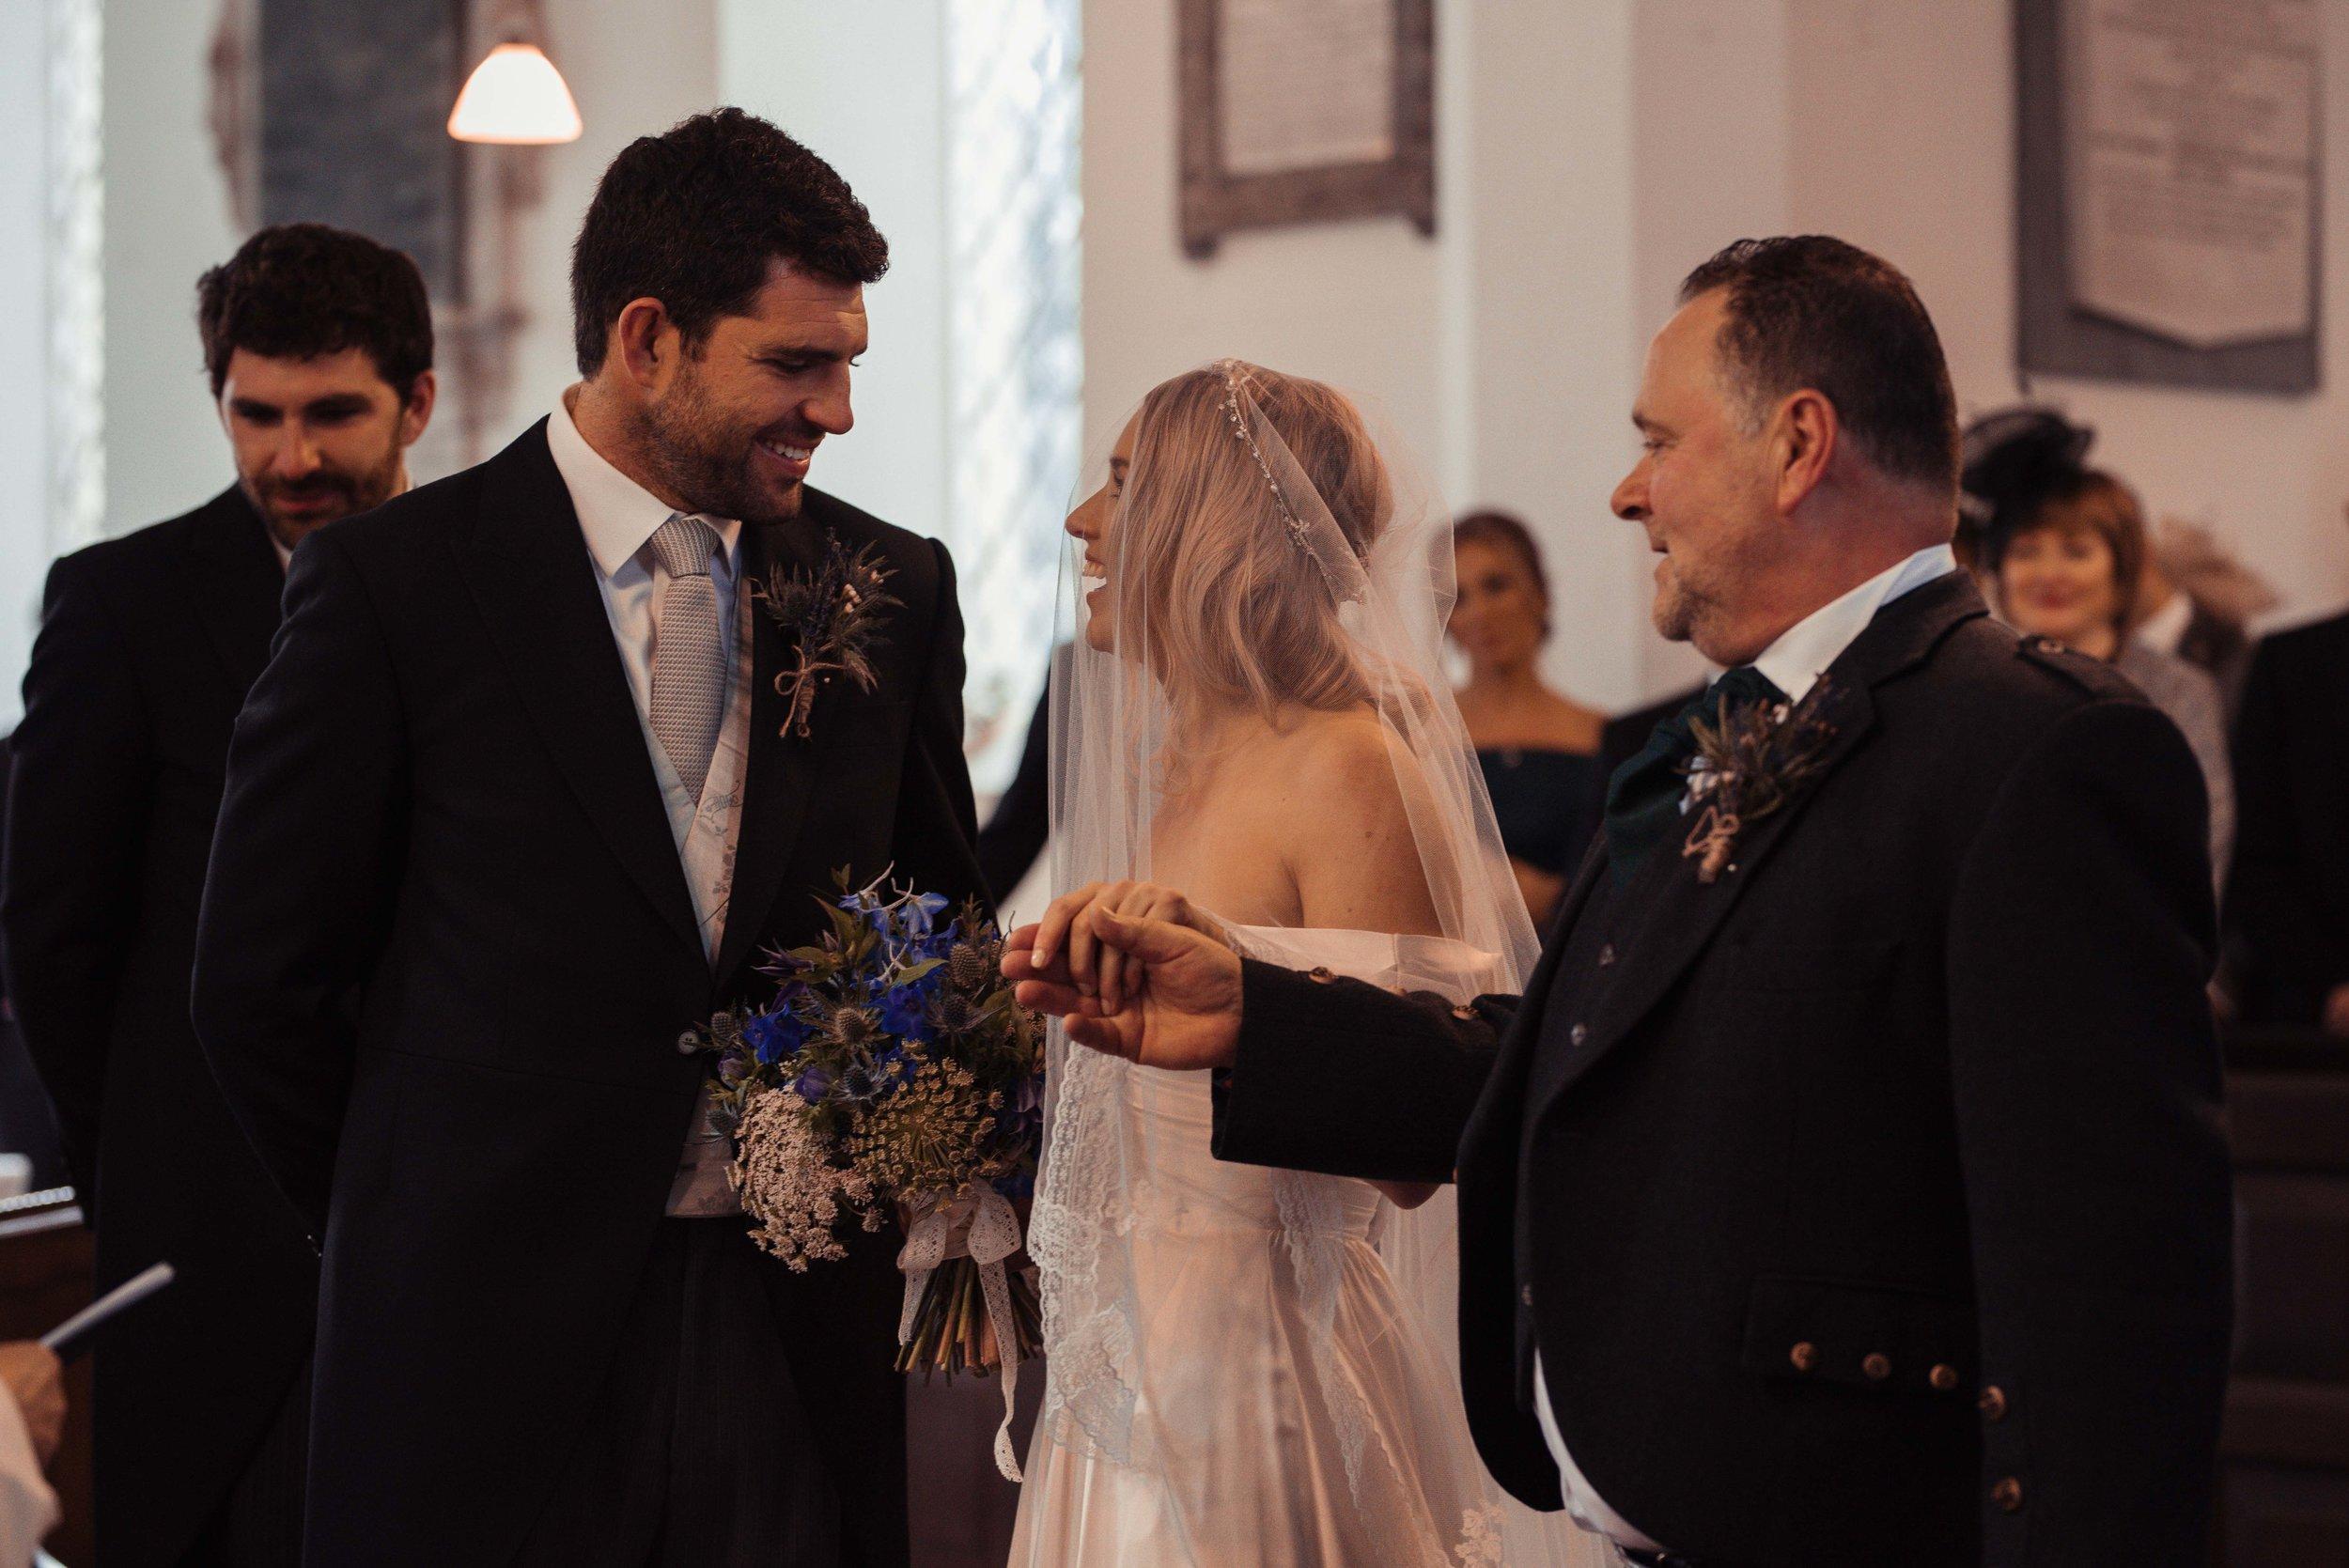 Askham-Hall-Wedding-Photography-26.jpg